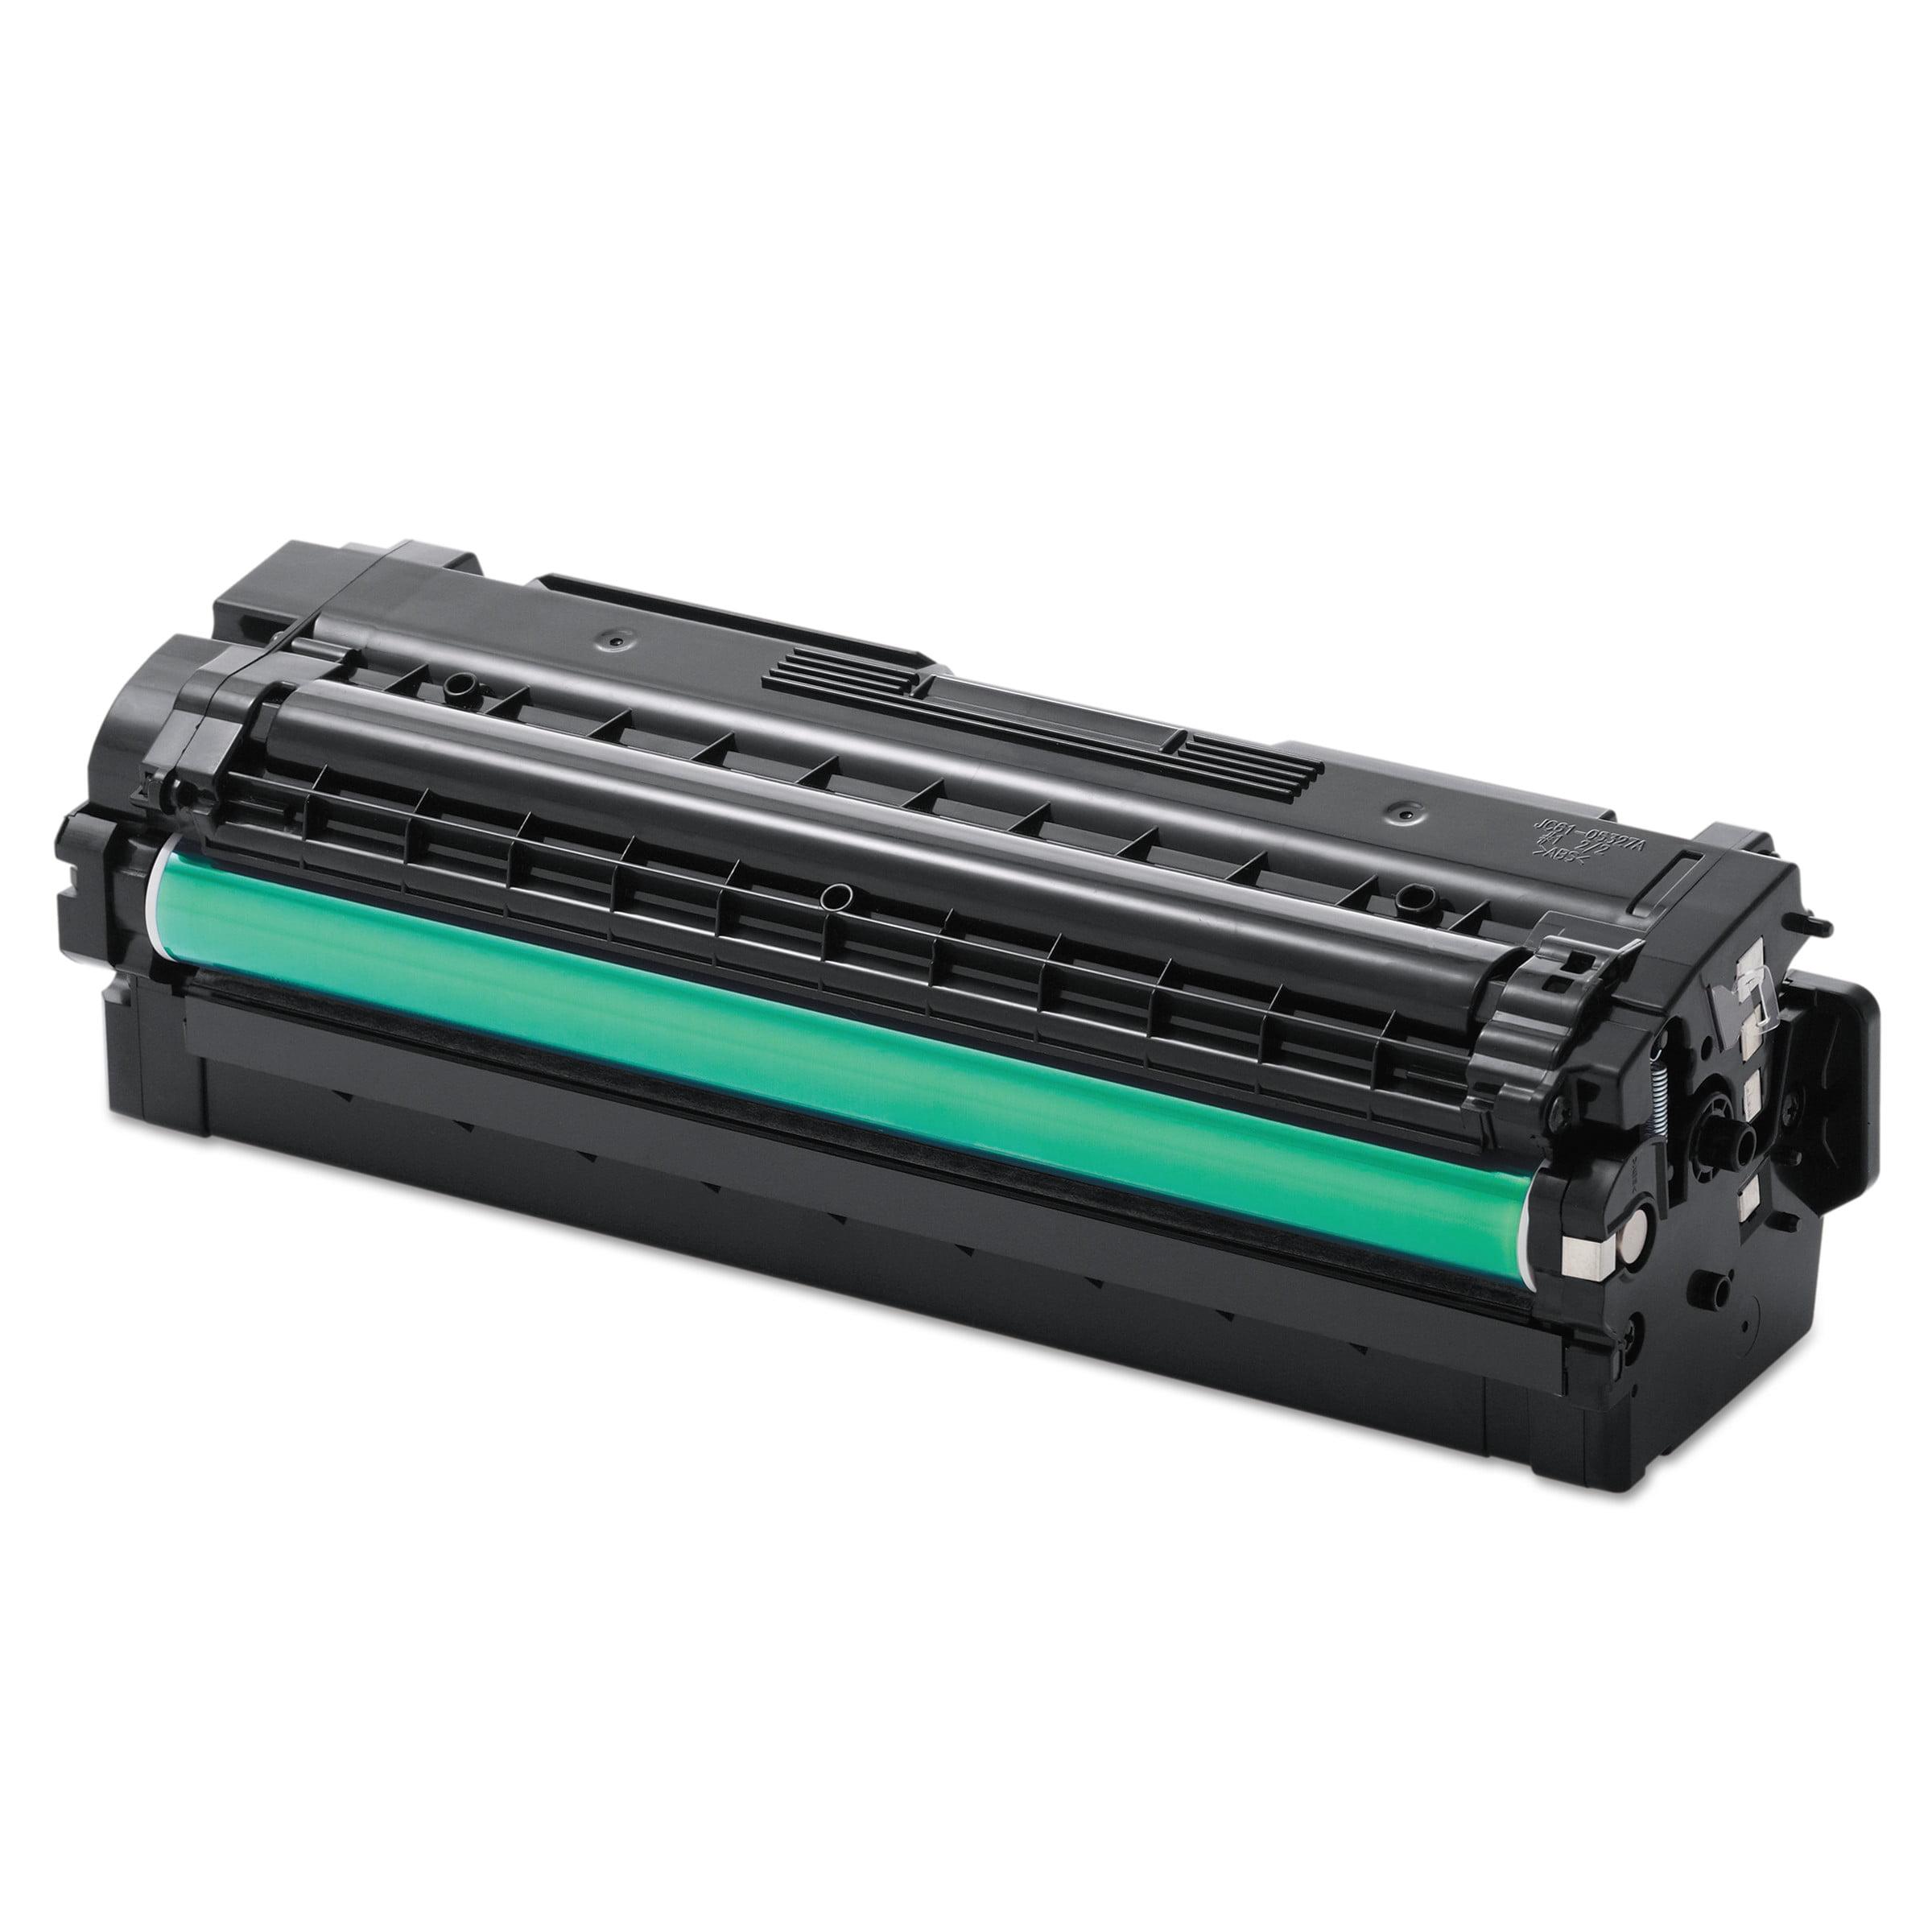 Samsung CLT-K505L (SU170A) Toner, 6000 Page-Yield, Black